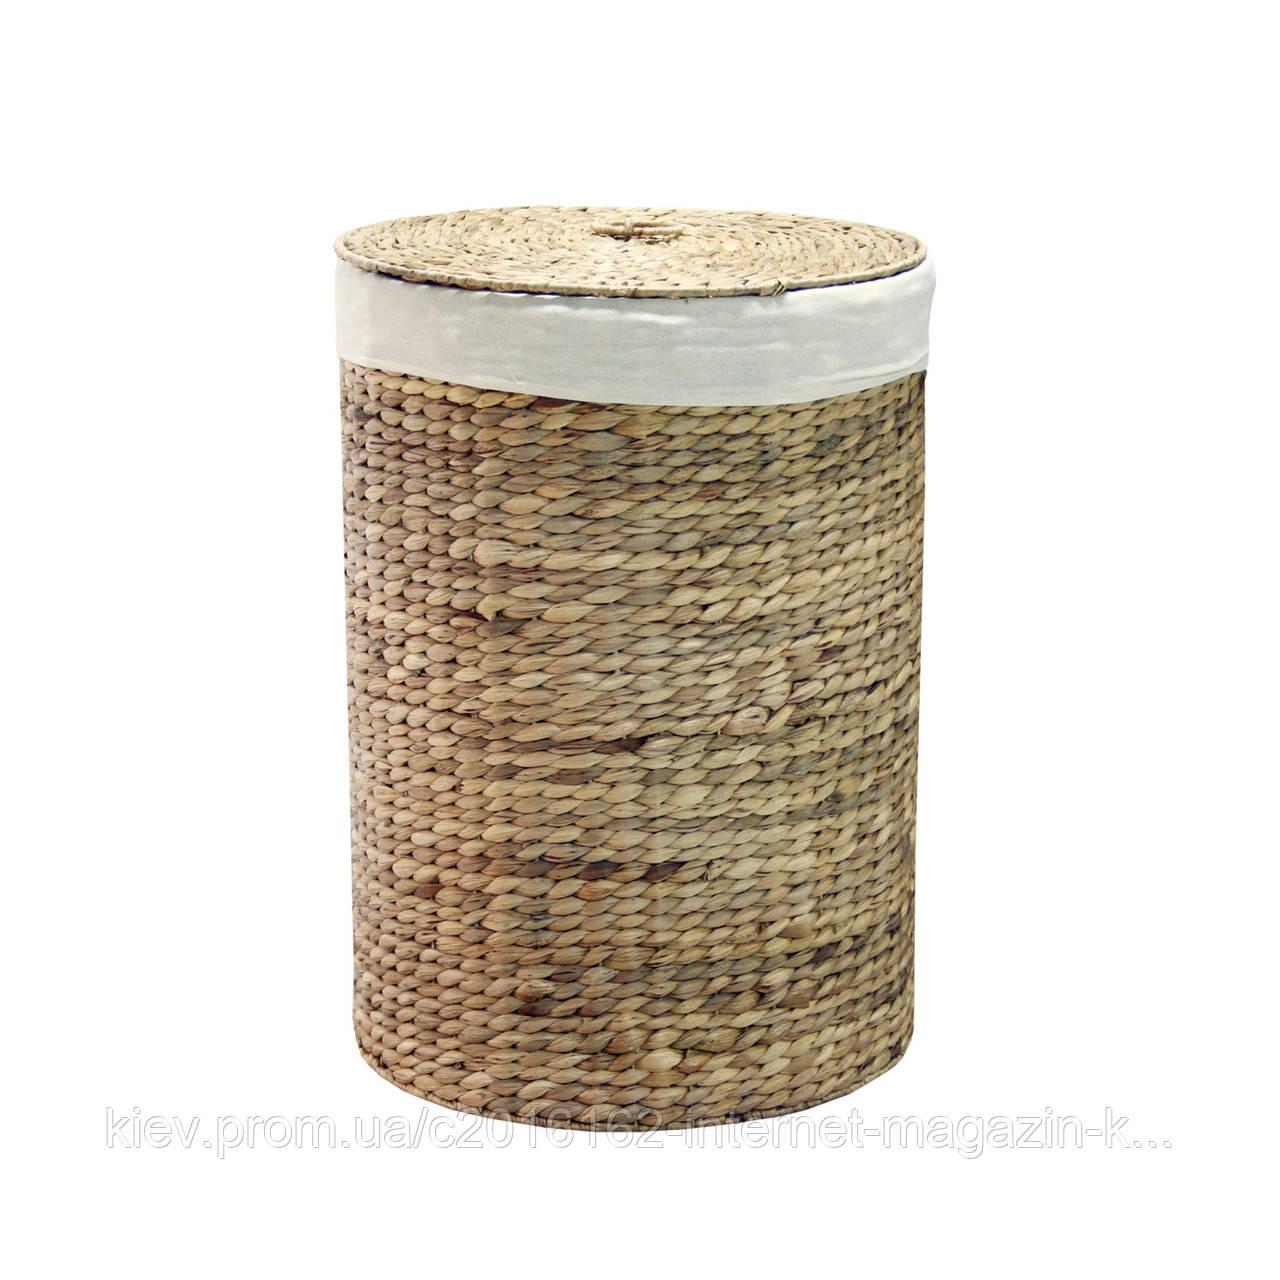 Корзина для белья плетеная Home4You MAYA-2  D37.5xH51cm  natural